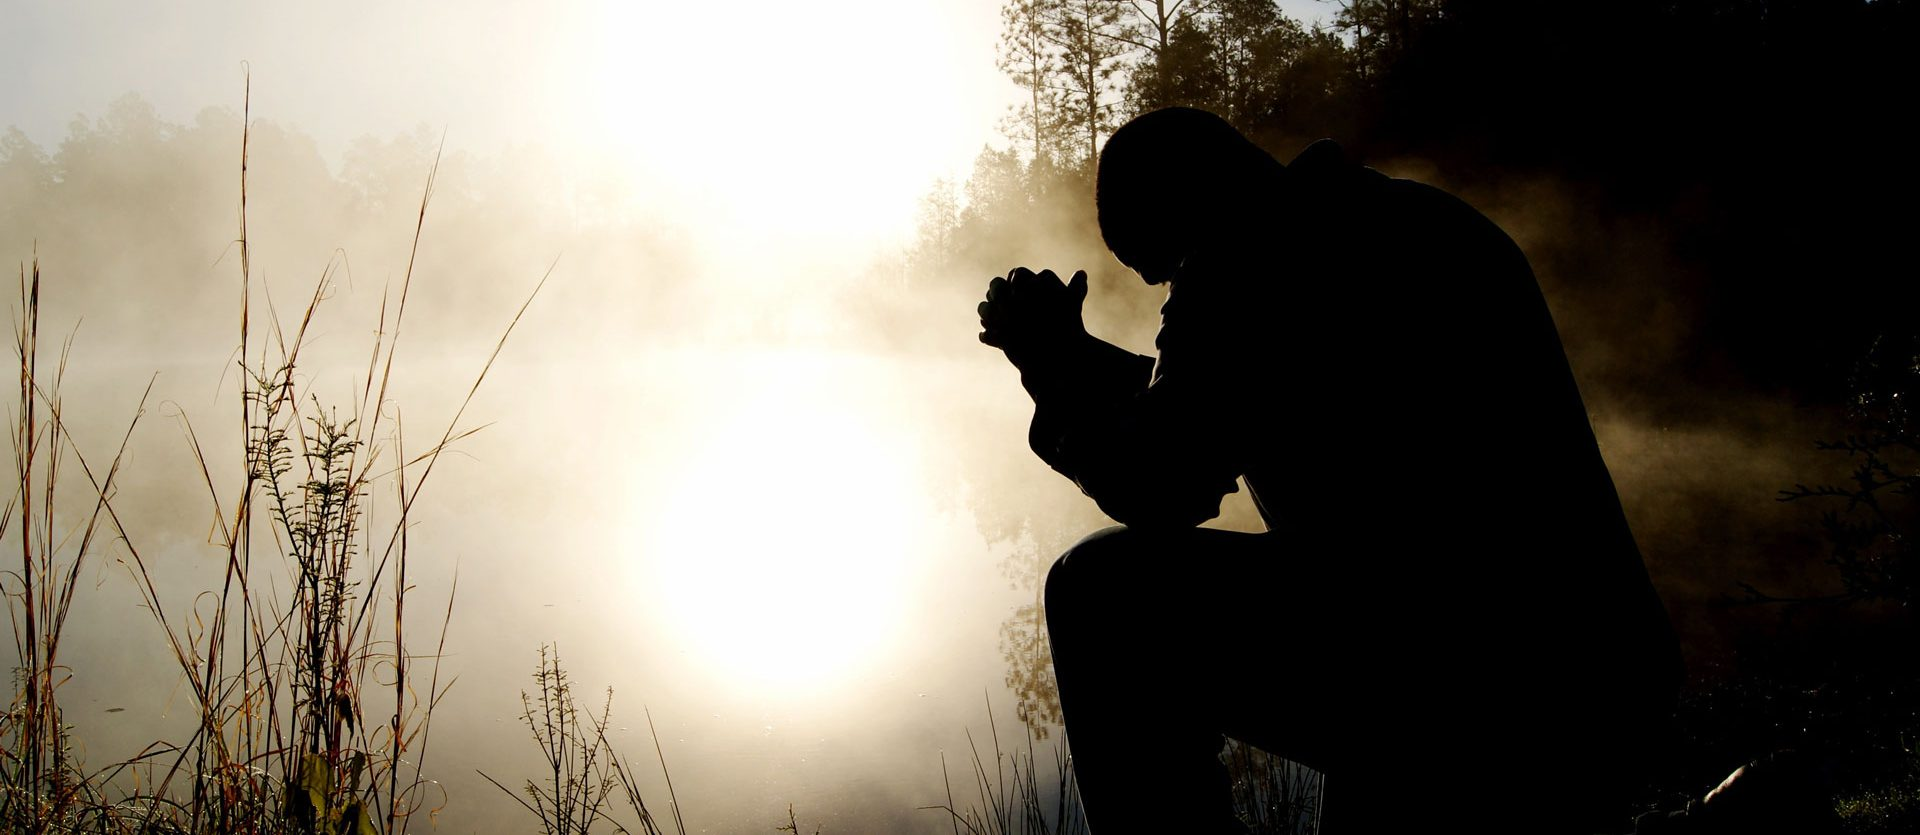 Tu Lucha es Espiritual